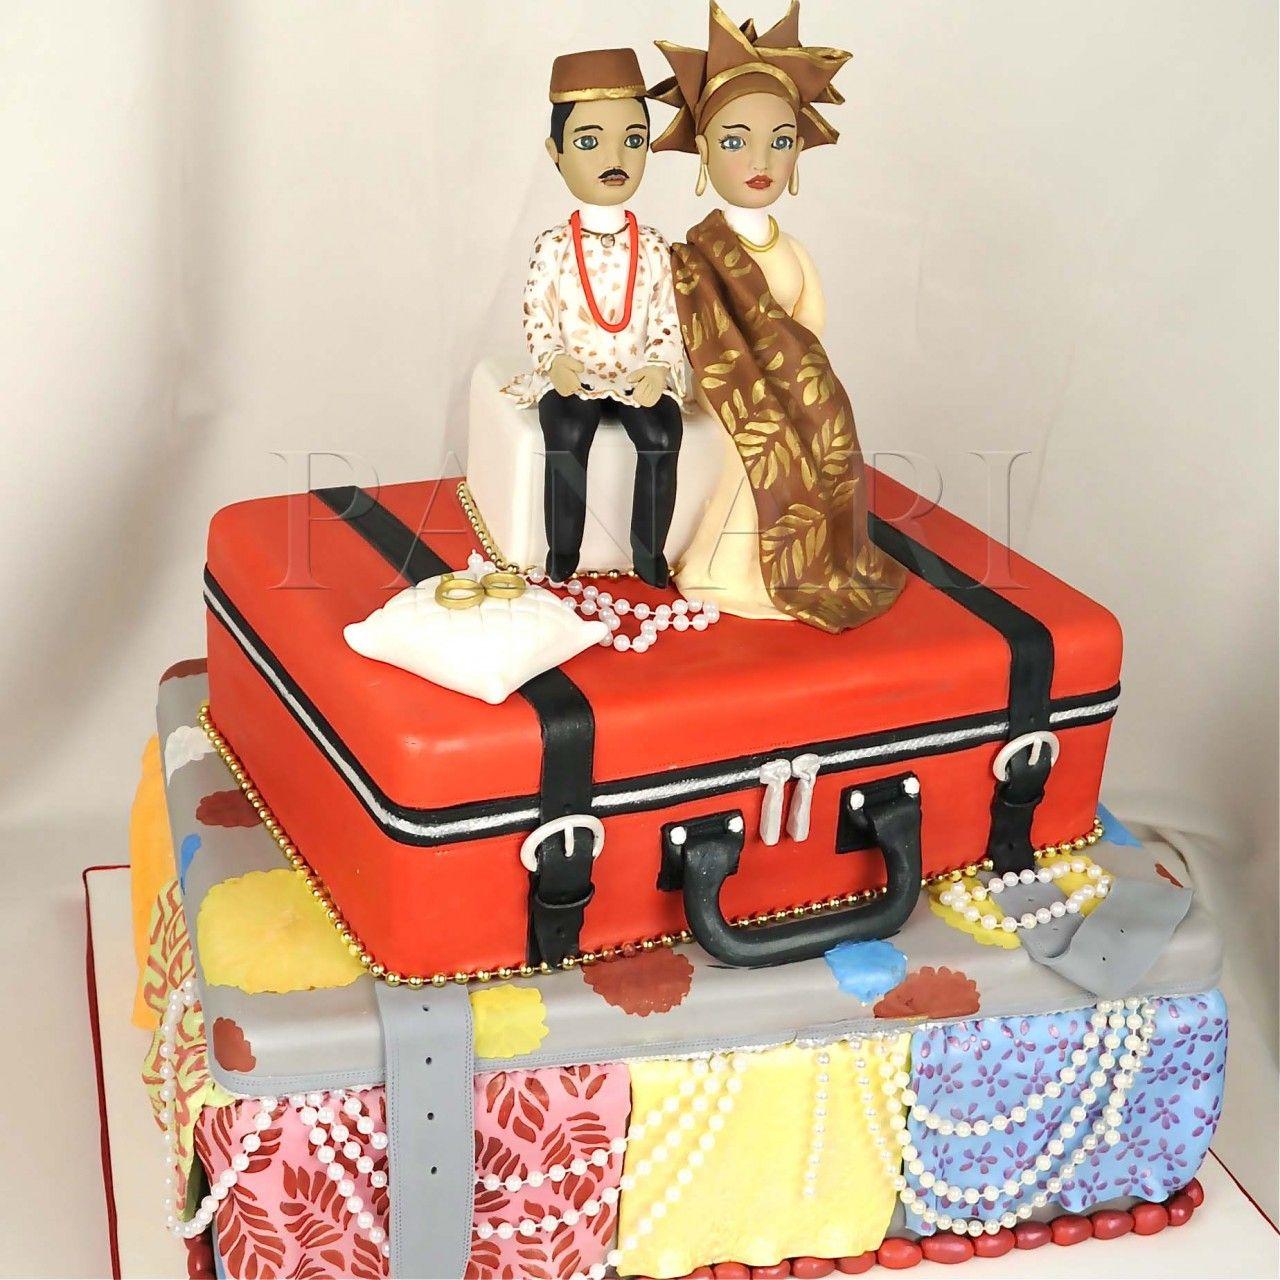 TRADITIONAL AFRICAN BRIDE & GROOM CAKE